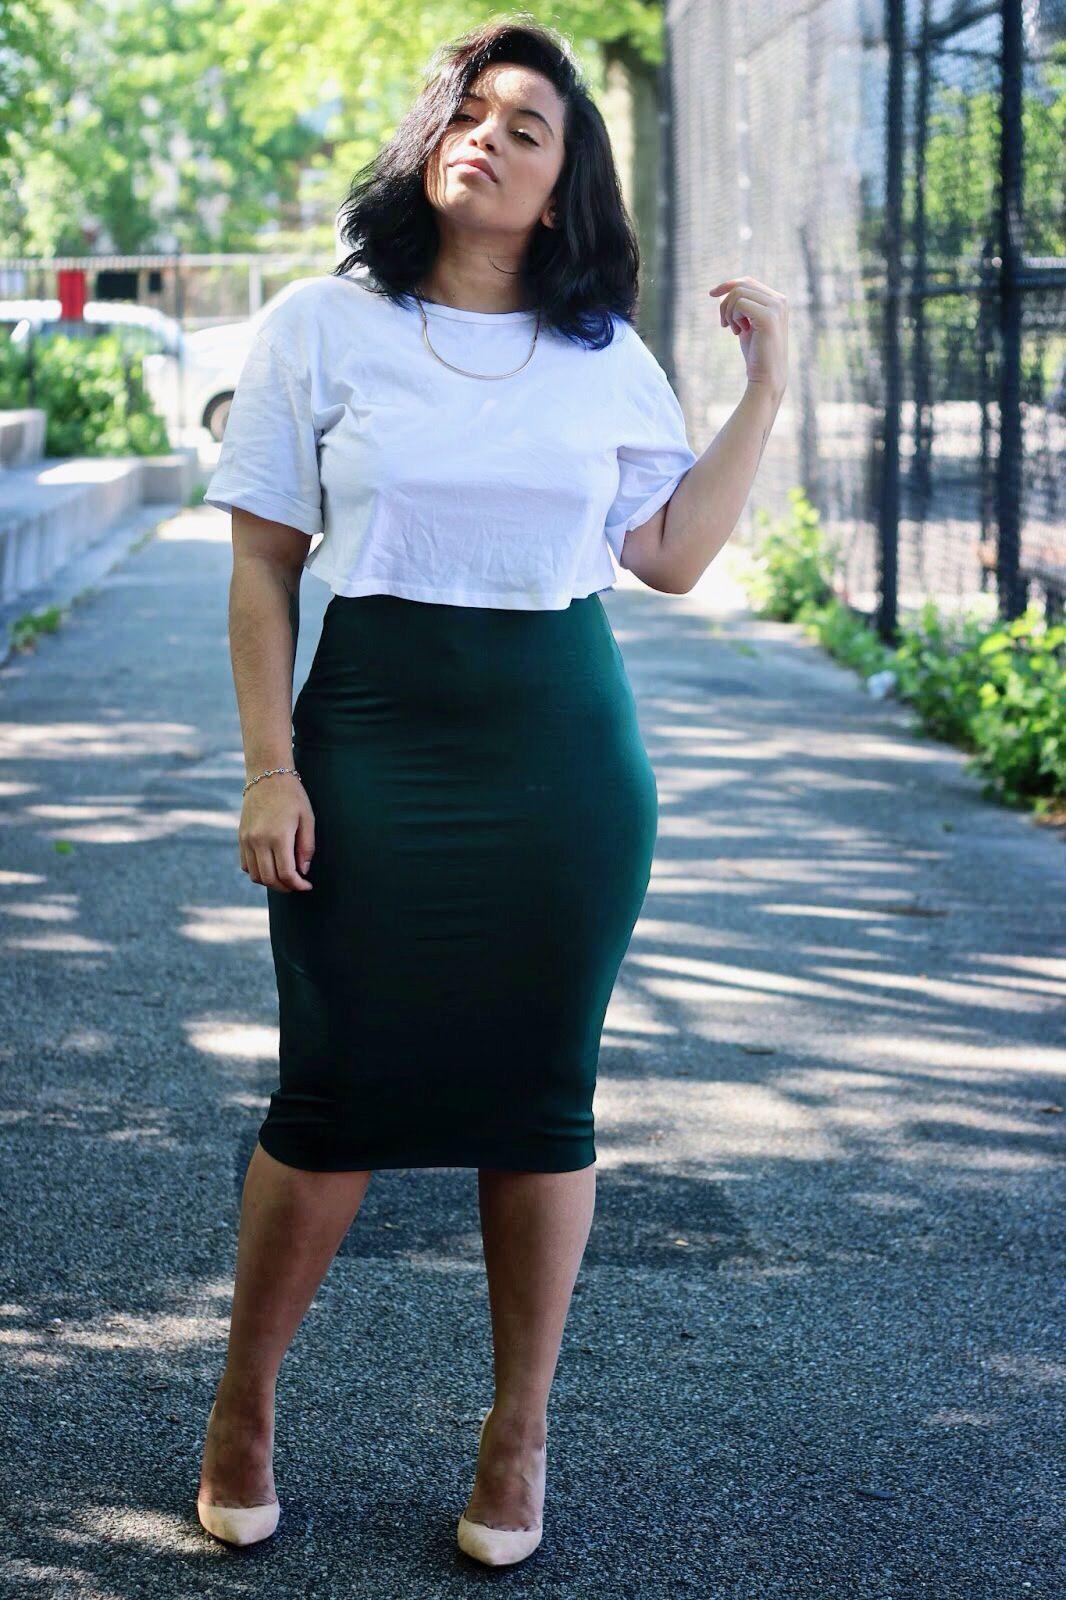 ee60b490cab5d Midi Pencil Skirt www.amourveroo.com.. I need a pencil skirt like this!